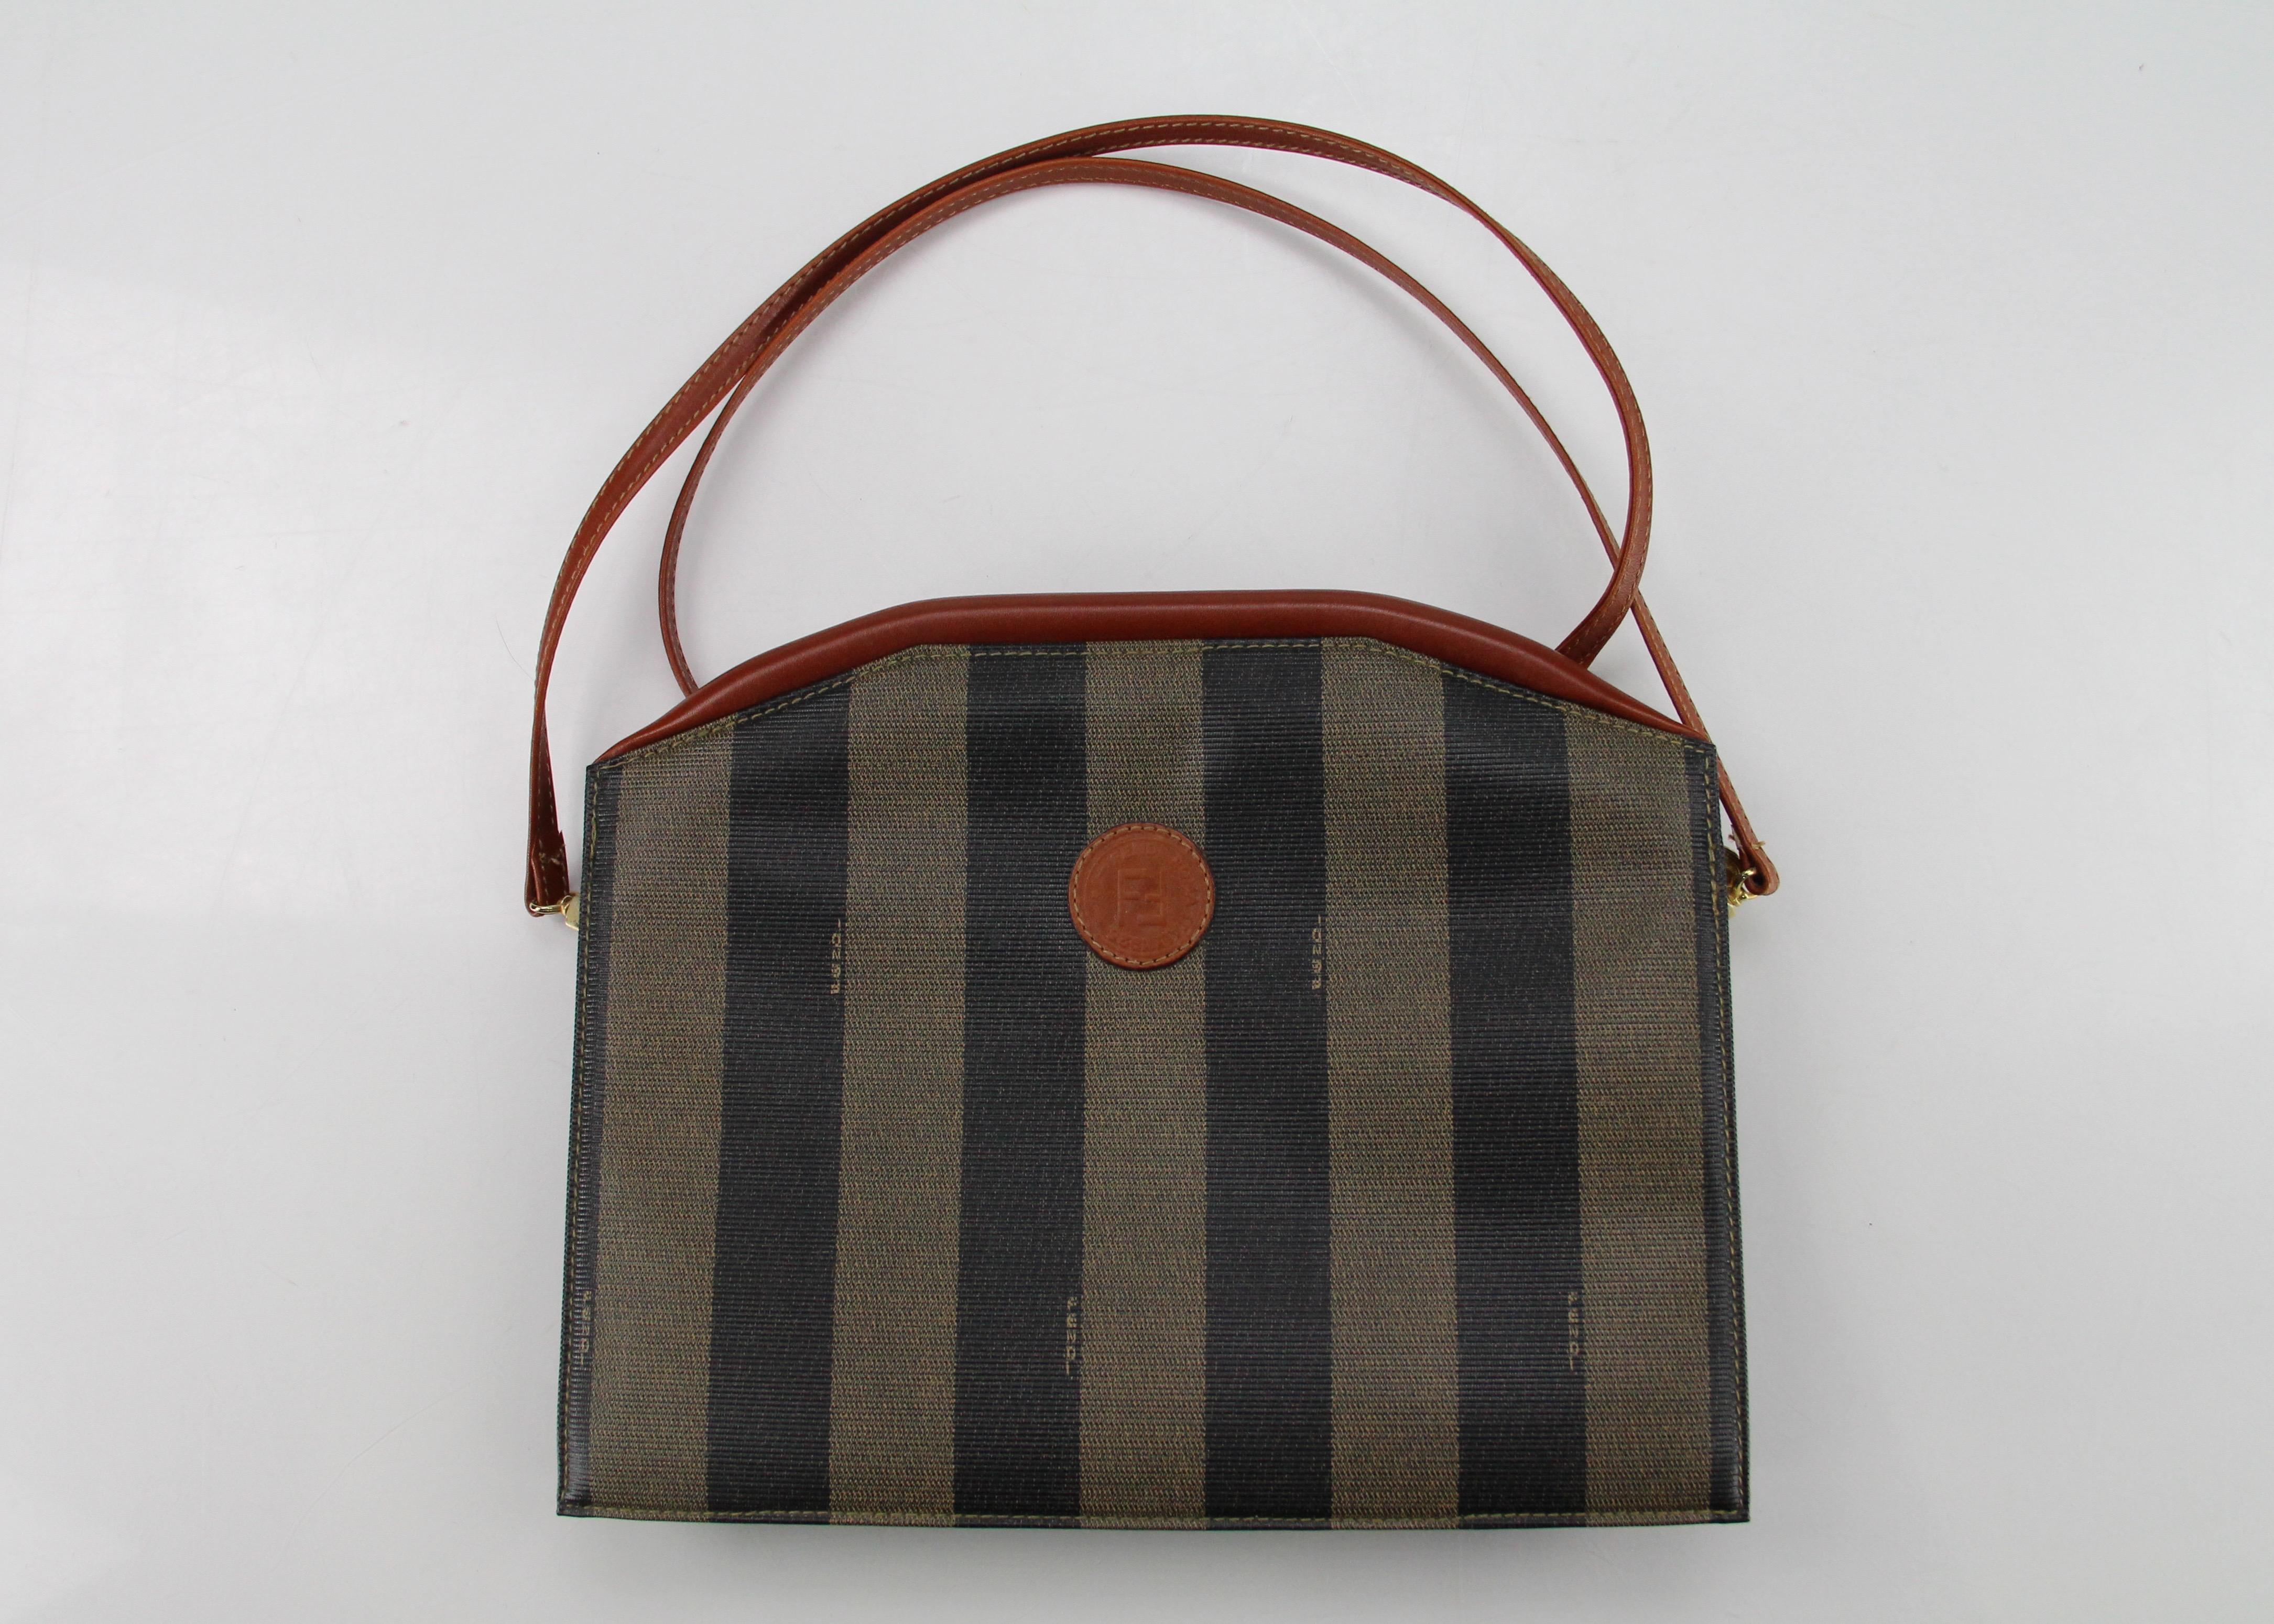 a930e7665d7f ireland fendi handbag vintage costume jewellery 320a1 bef7c